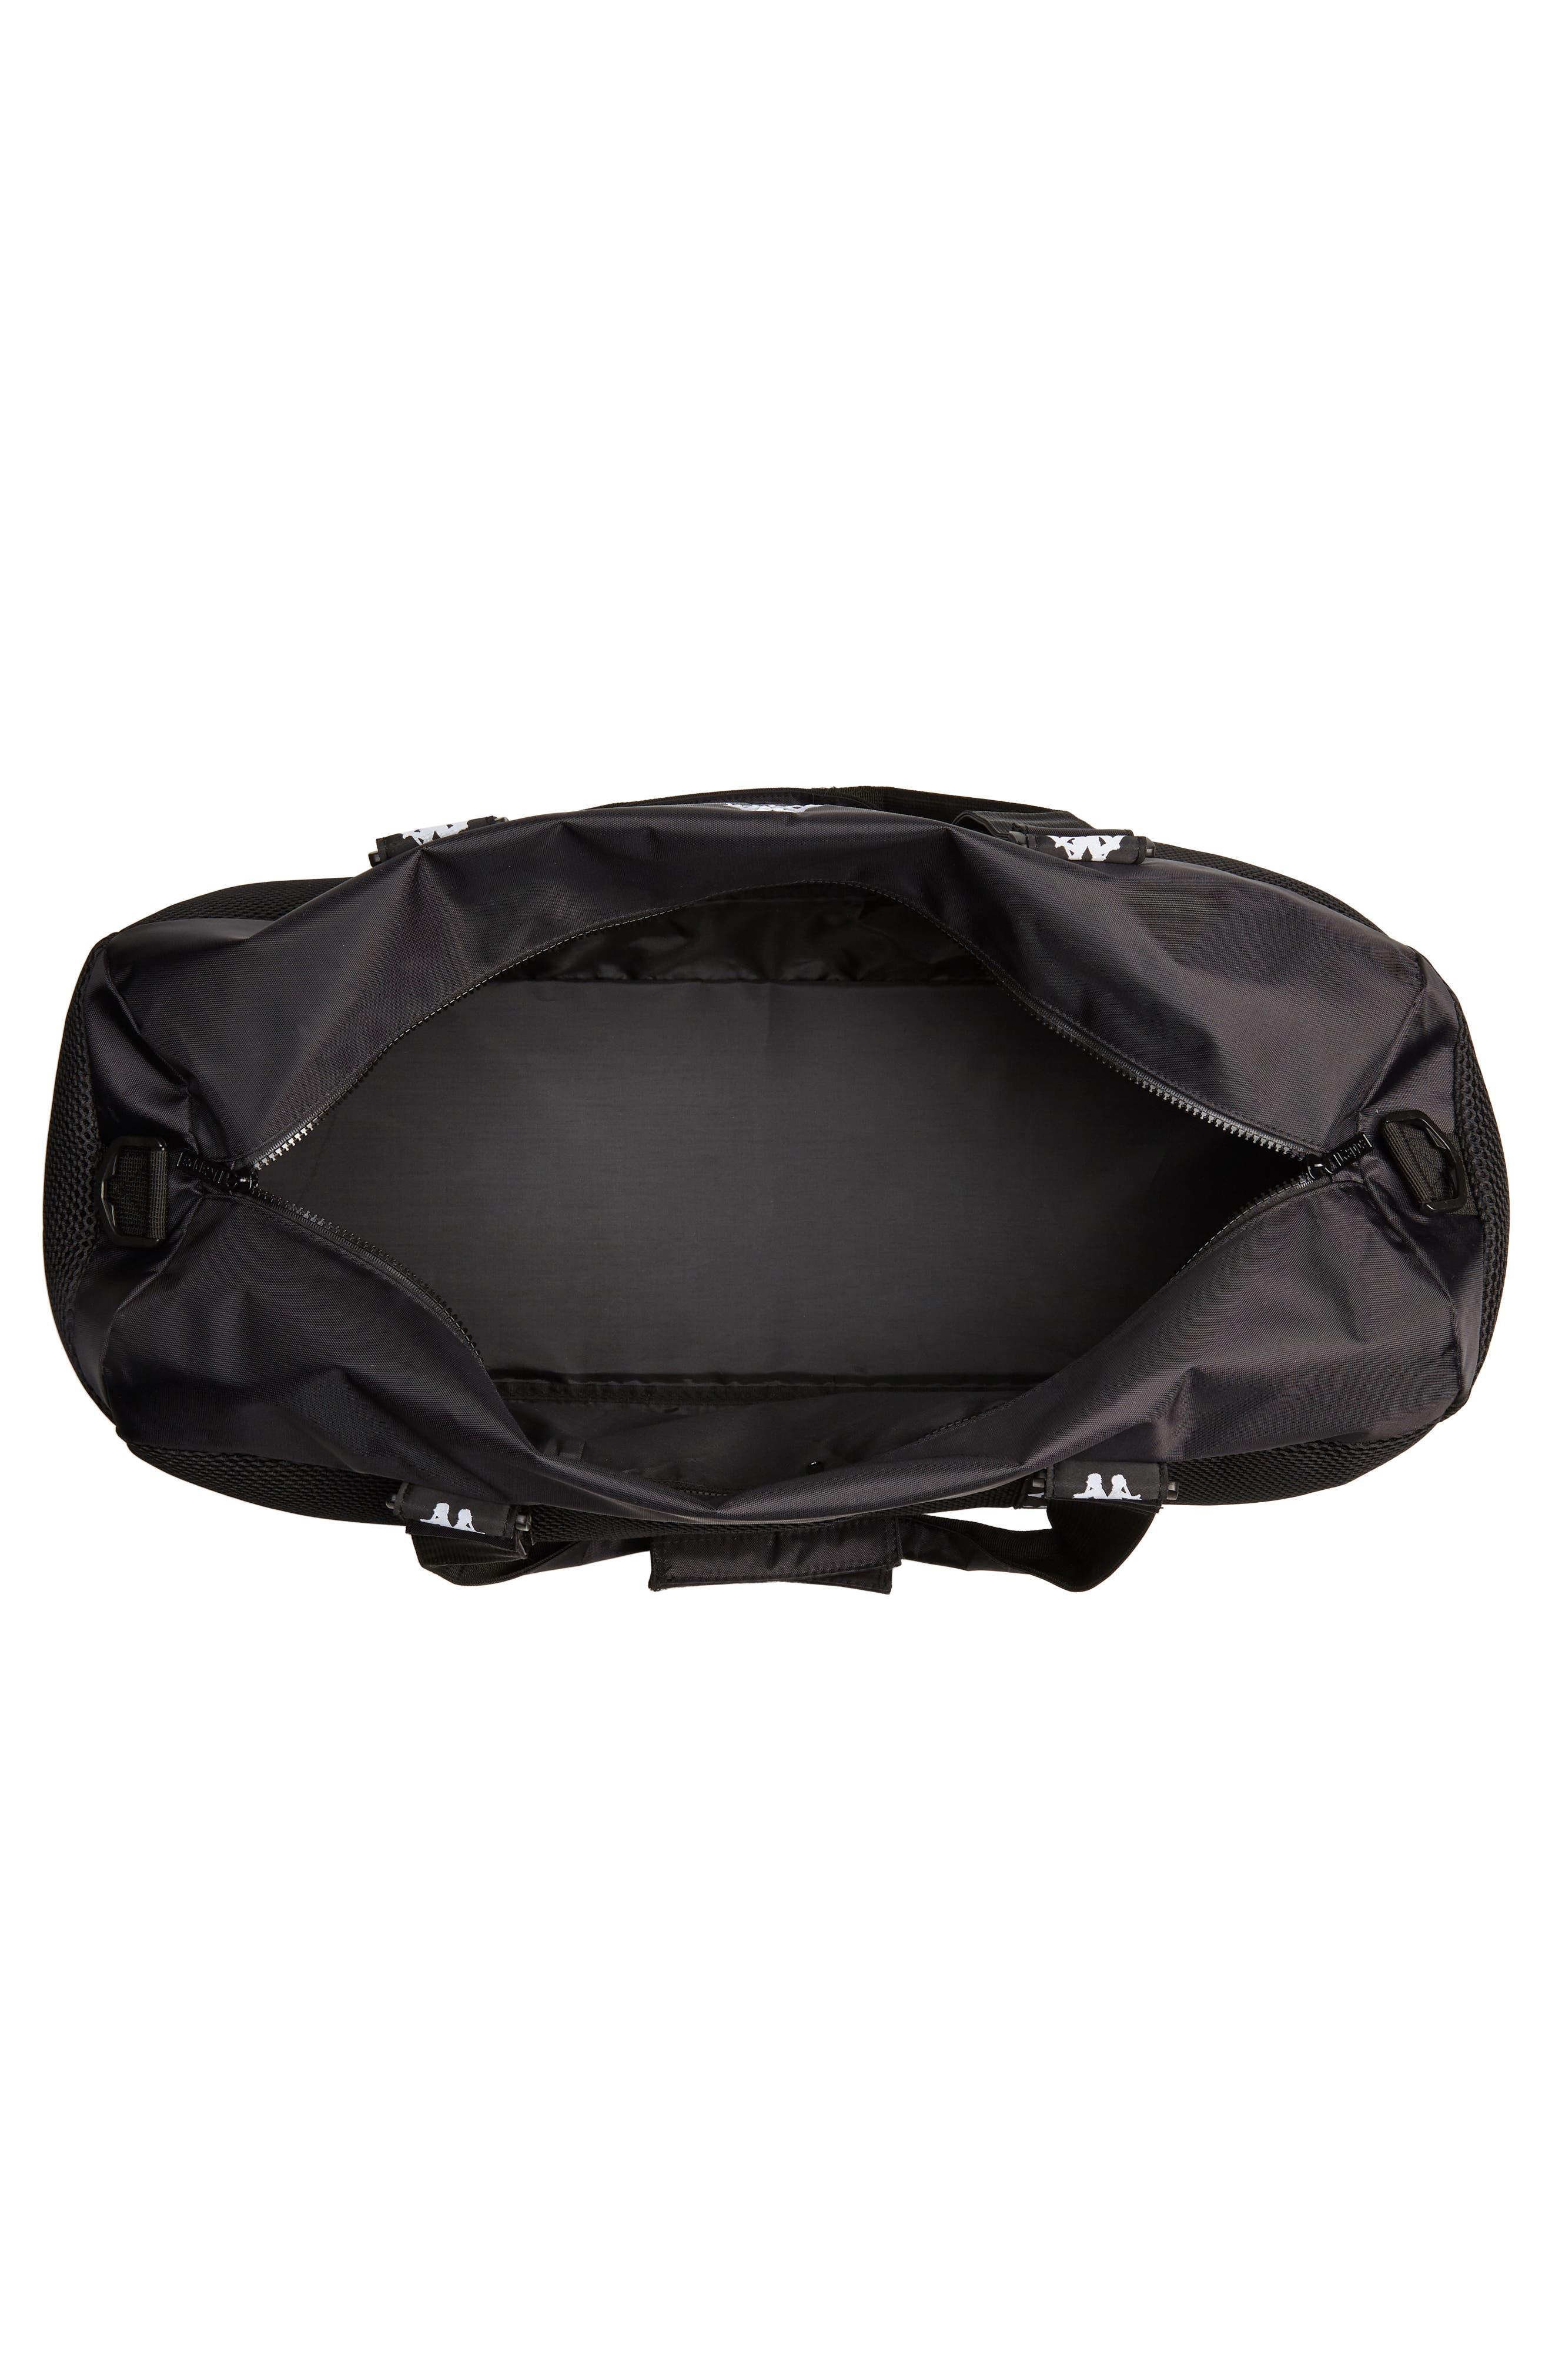 XL Athletic Duffel Bag,                             Alternate thumbnail 4, color,                             BLACK-WHITE